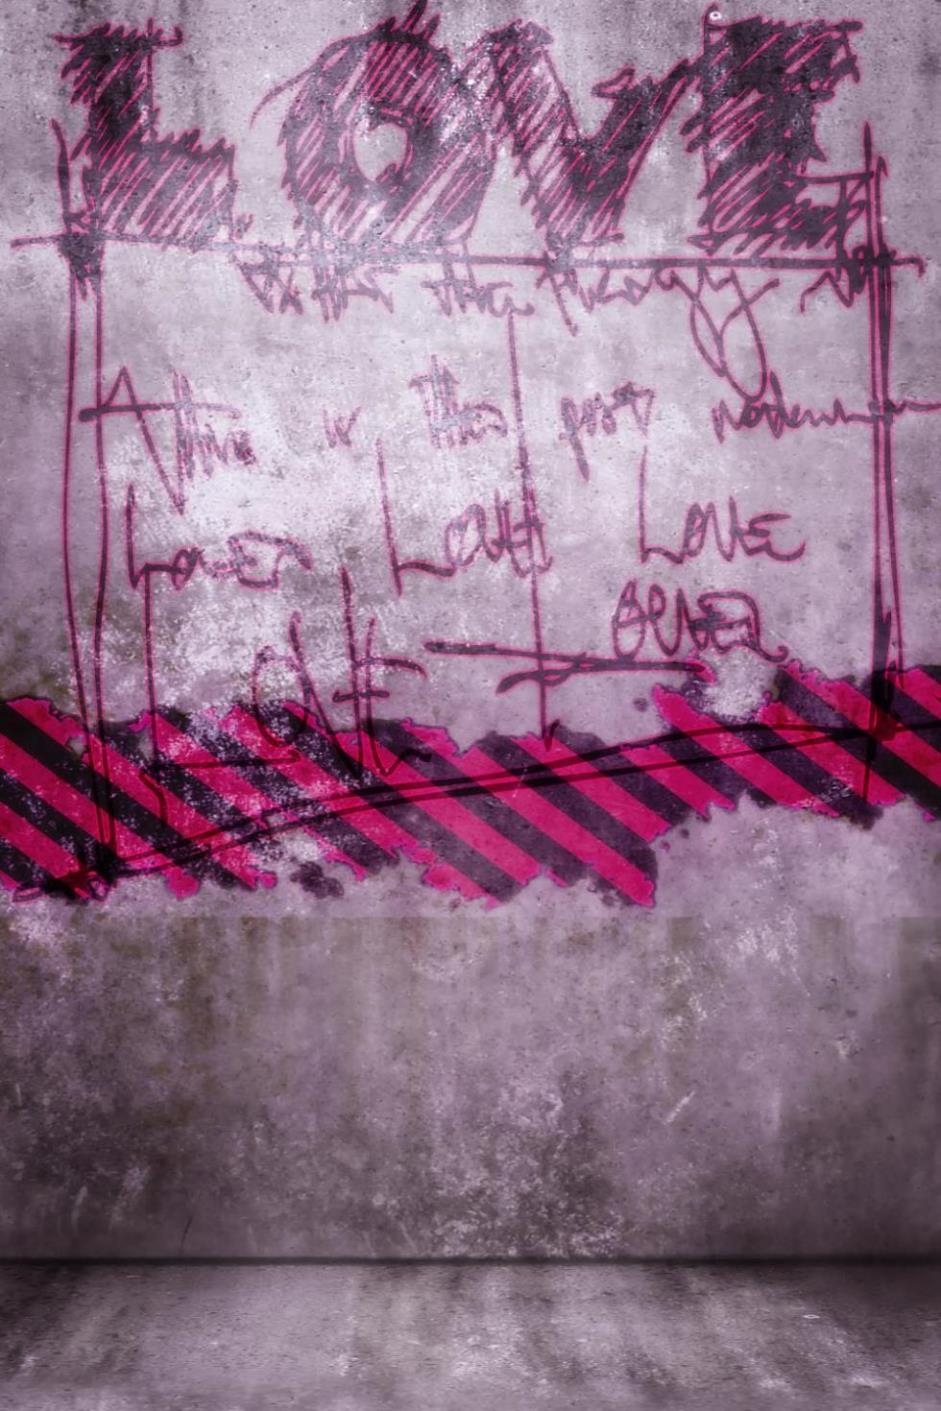 Graffiti wall vinyl - Photography Background 300cm 200cm Love Graffiti Wall Valentine S Day Thick Cloth Backdrop Zj China